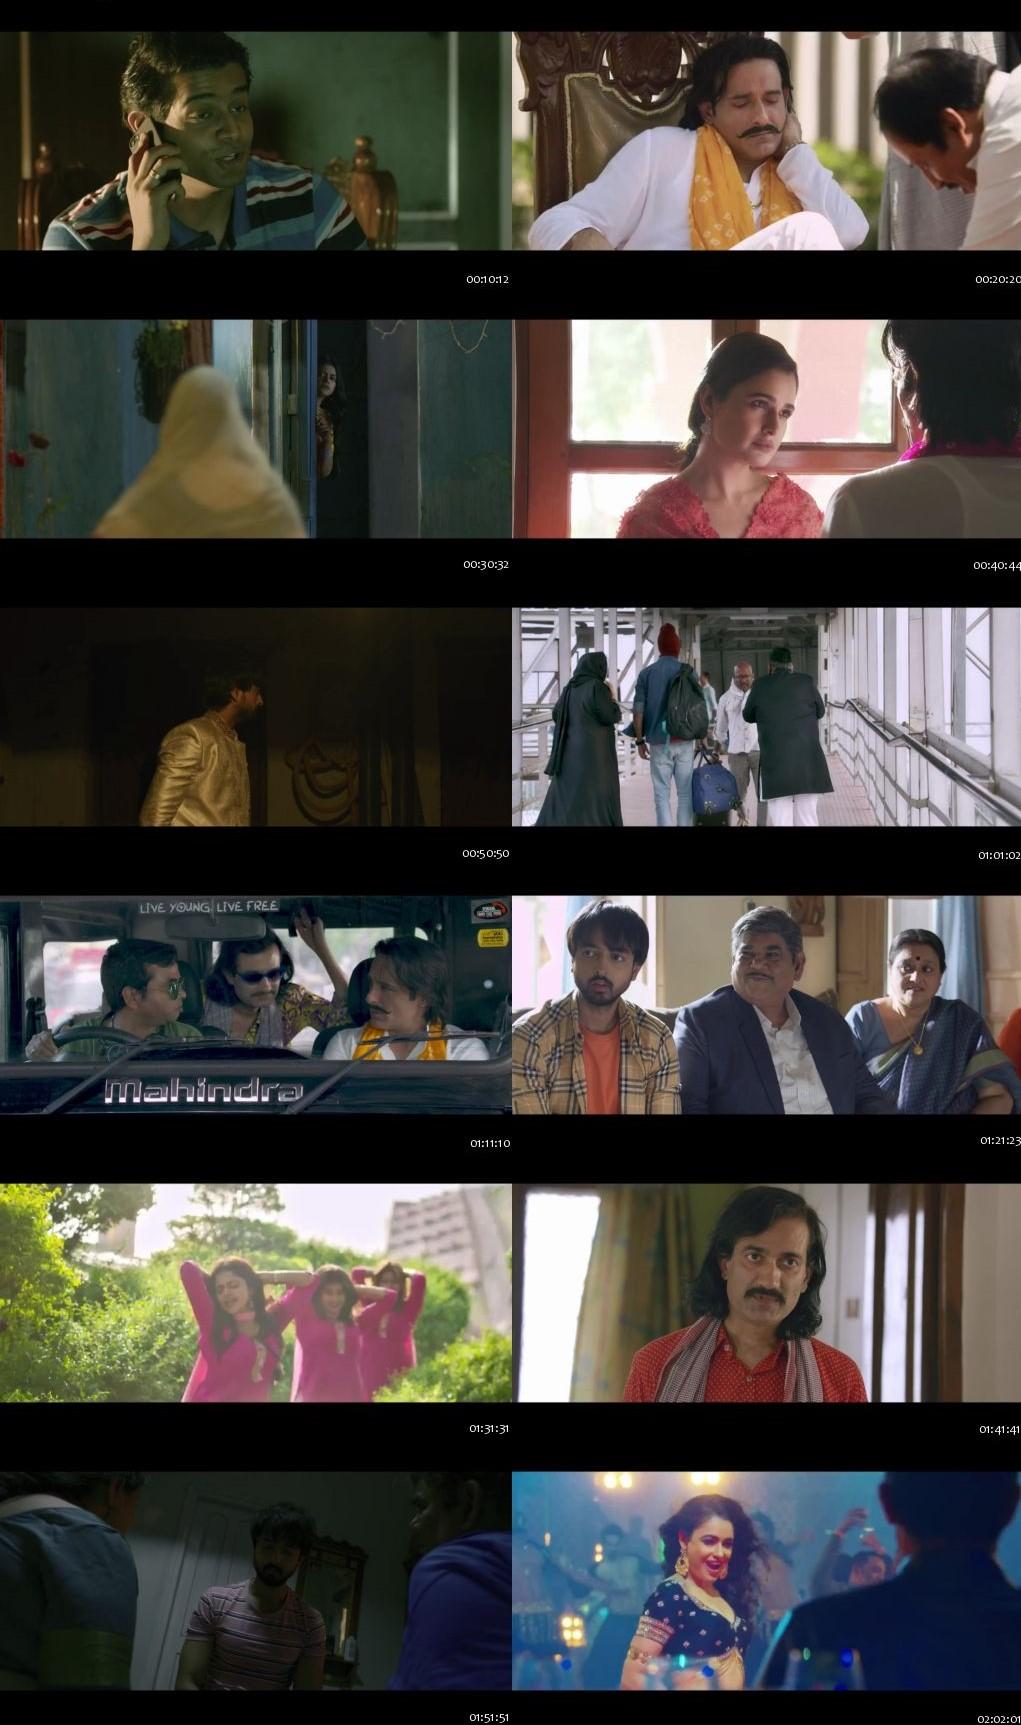 Sab Kushal Mangal 2020 Full Hindi Movie Online Watch HDRip 720p